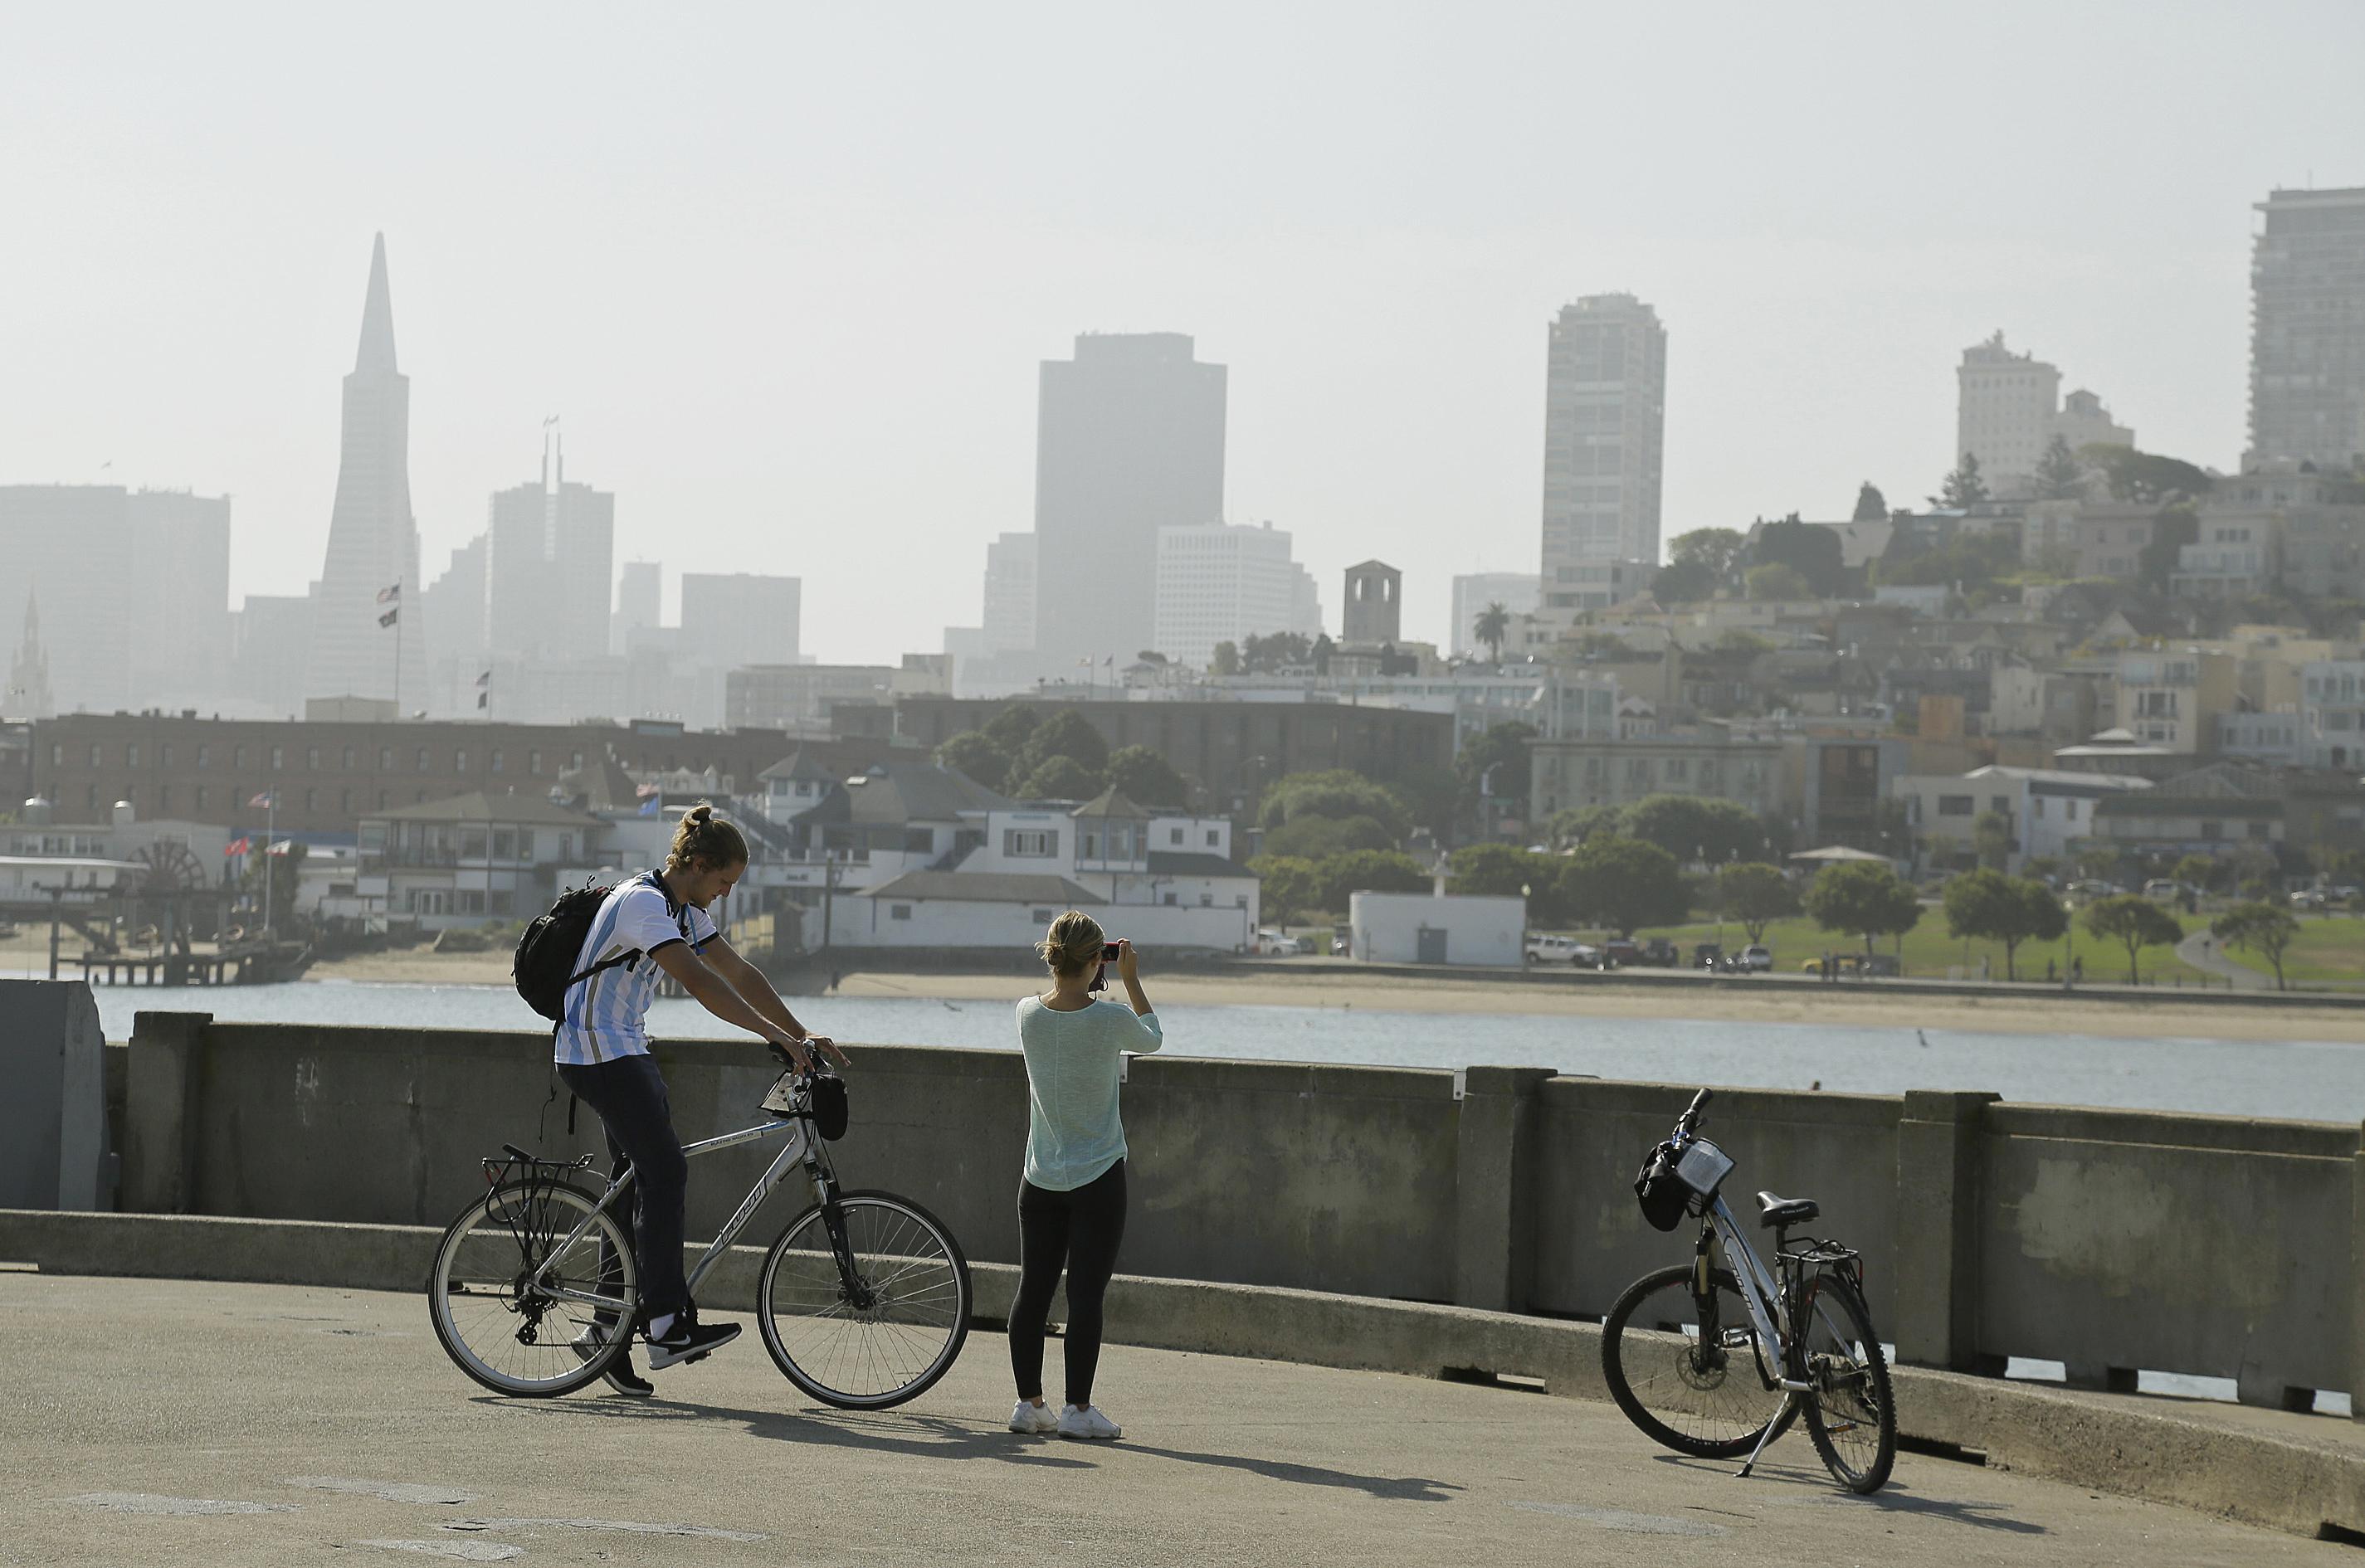 Man Shot, Killed While Playing 'Pokemon Go' in San Francisco's Fisherman's Wharf